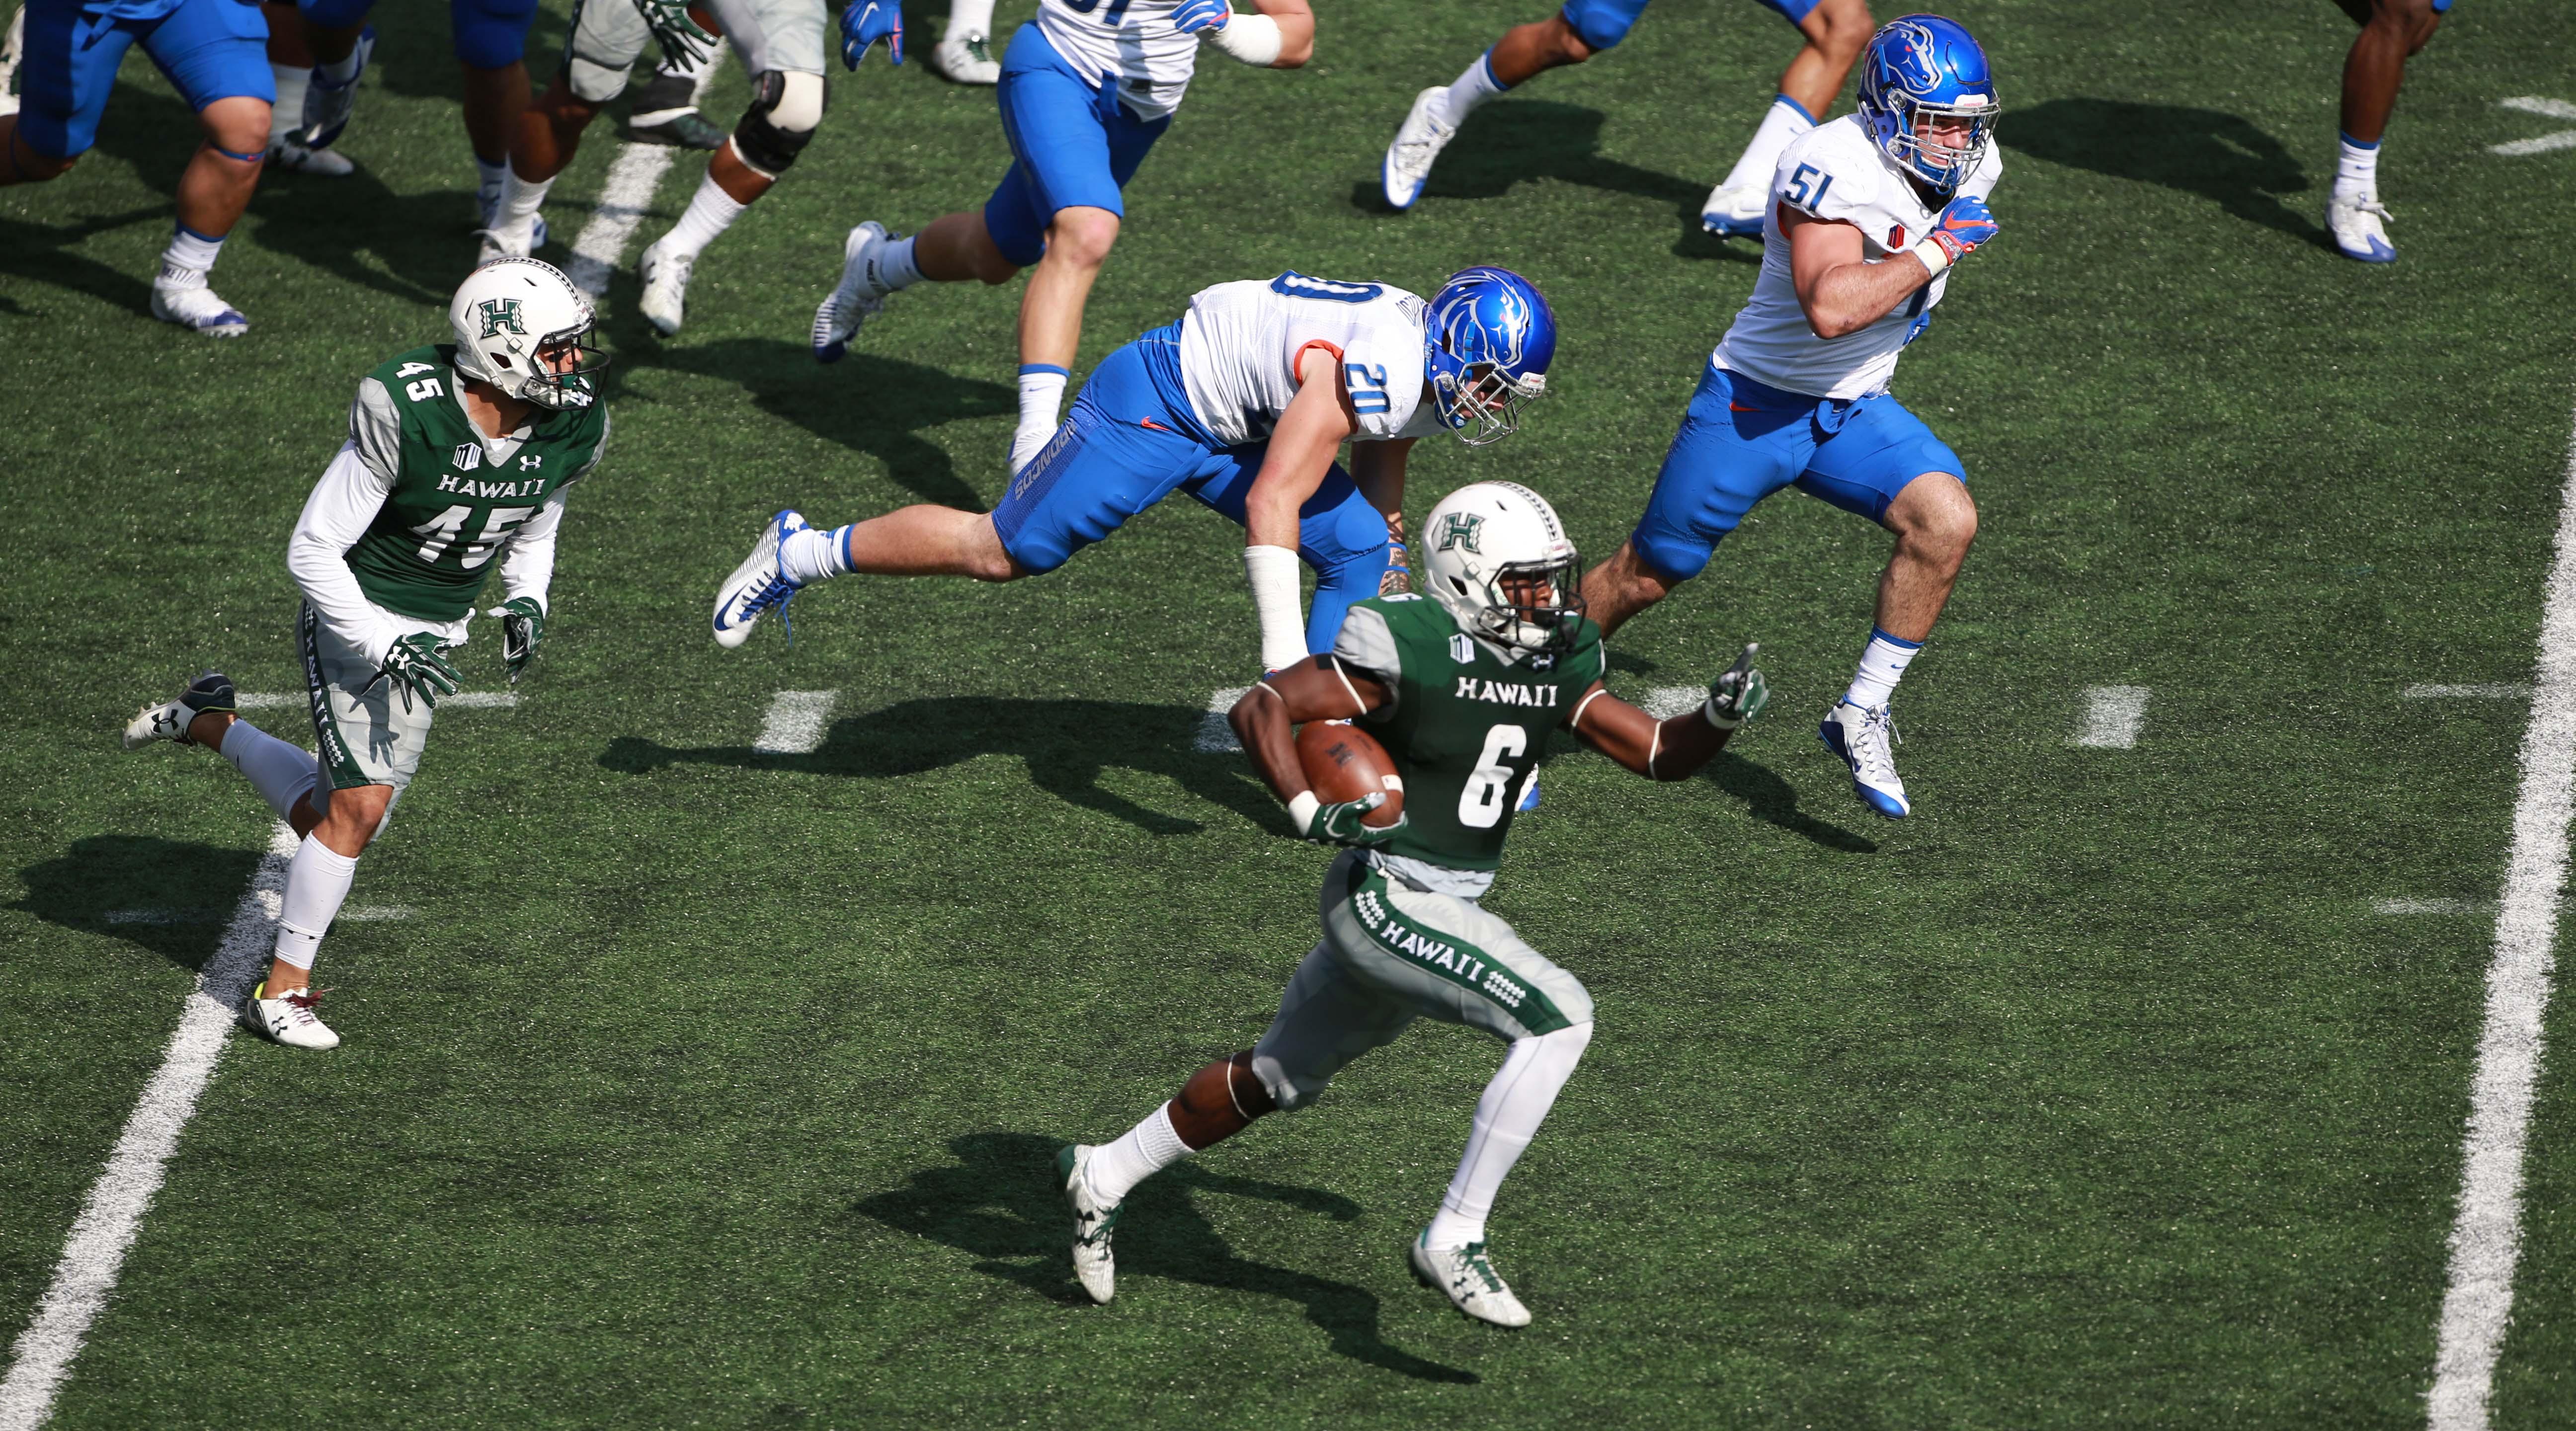 NCAA Football: Boise State at Hawaii